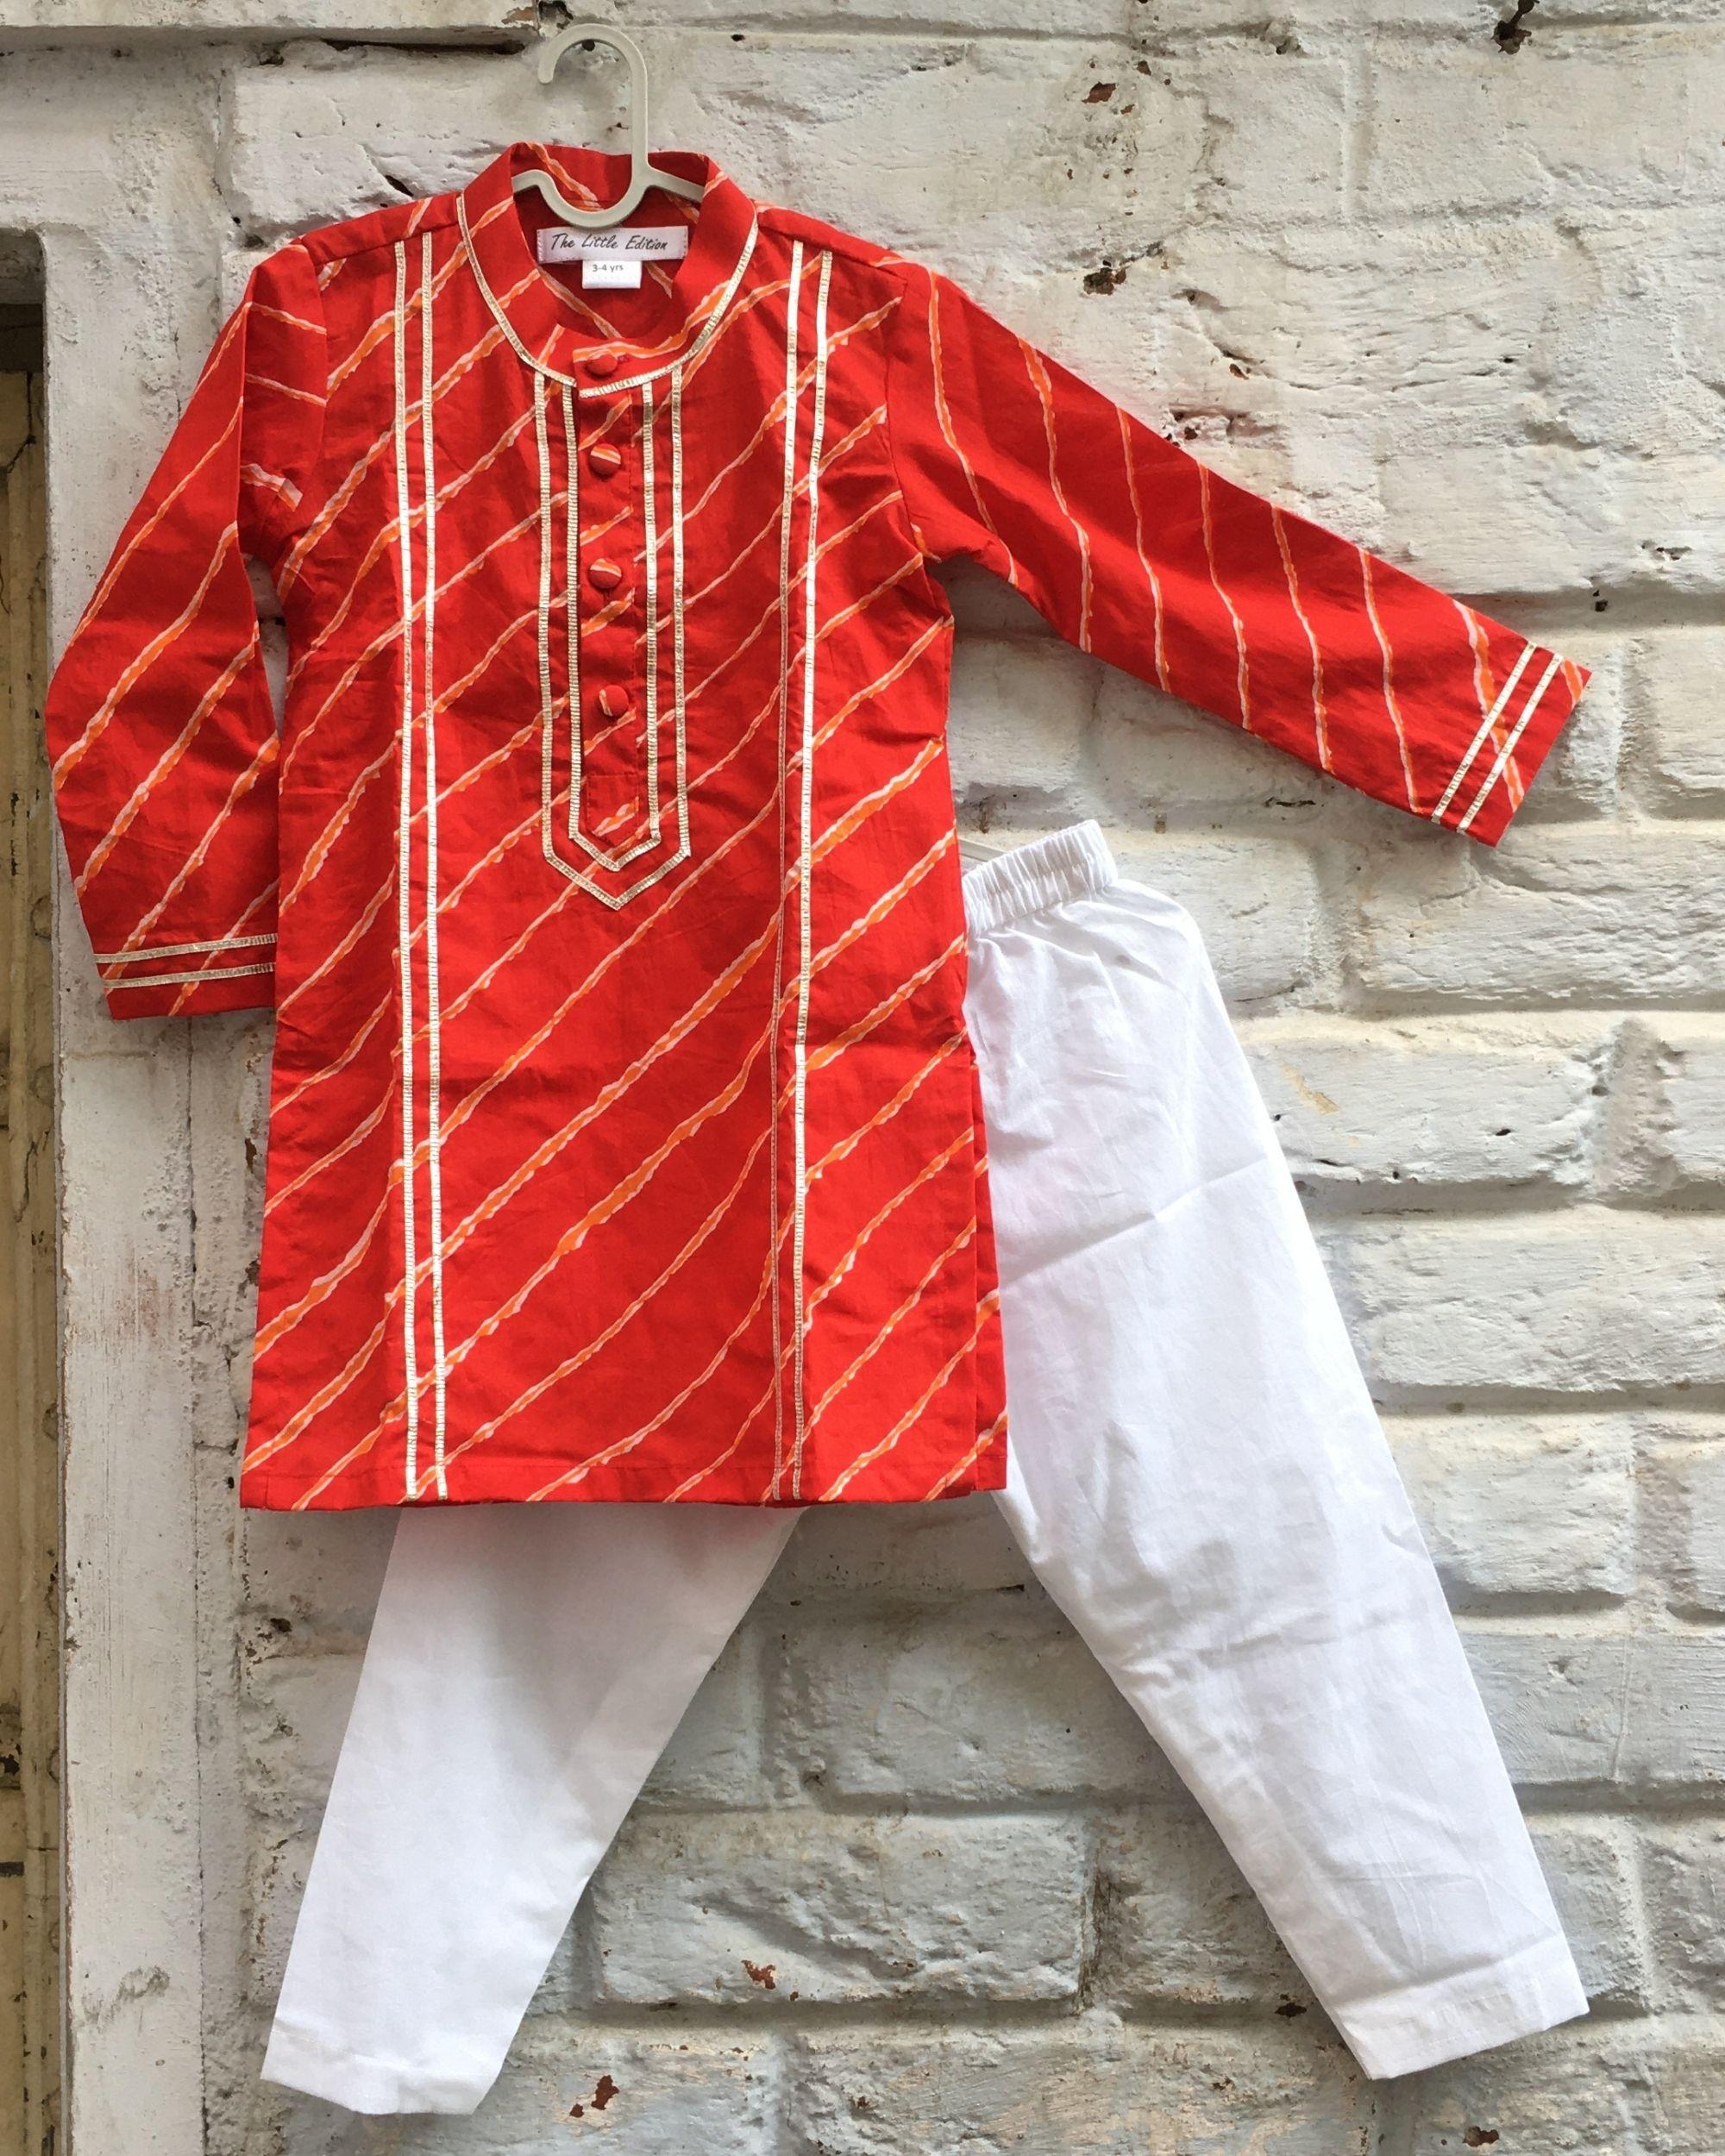 Red gota leheriya kurta and white pyjama - set of two